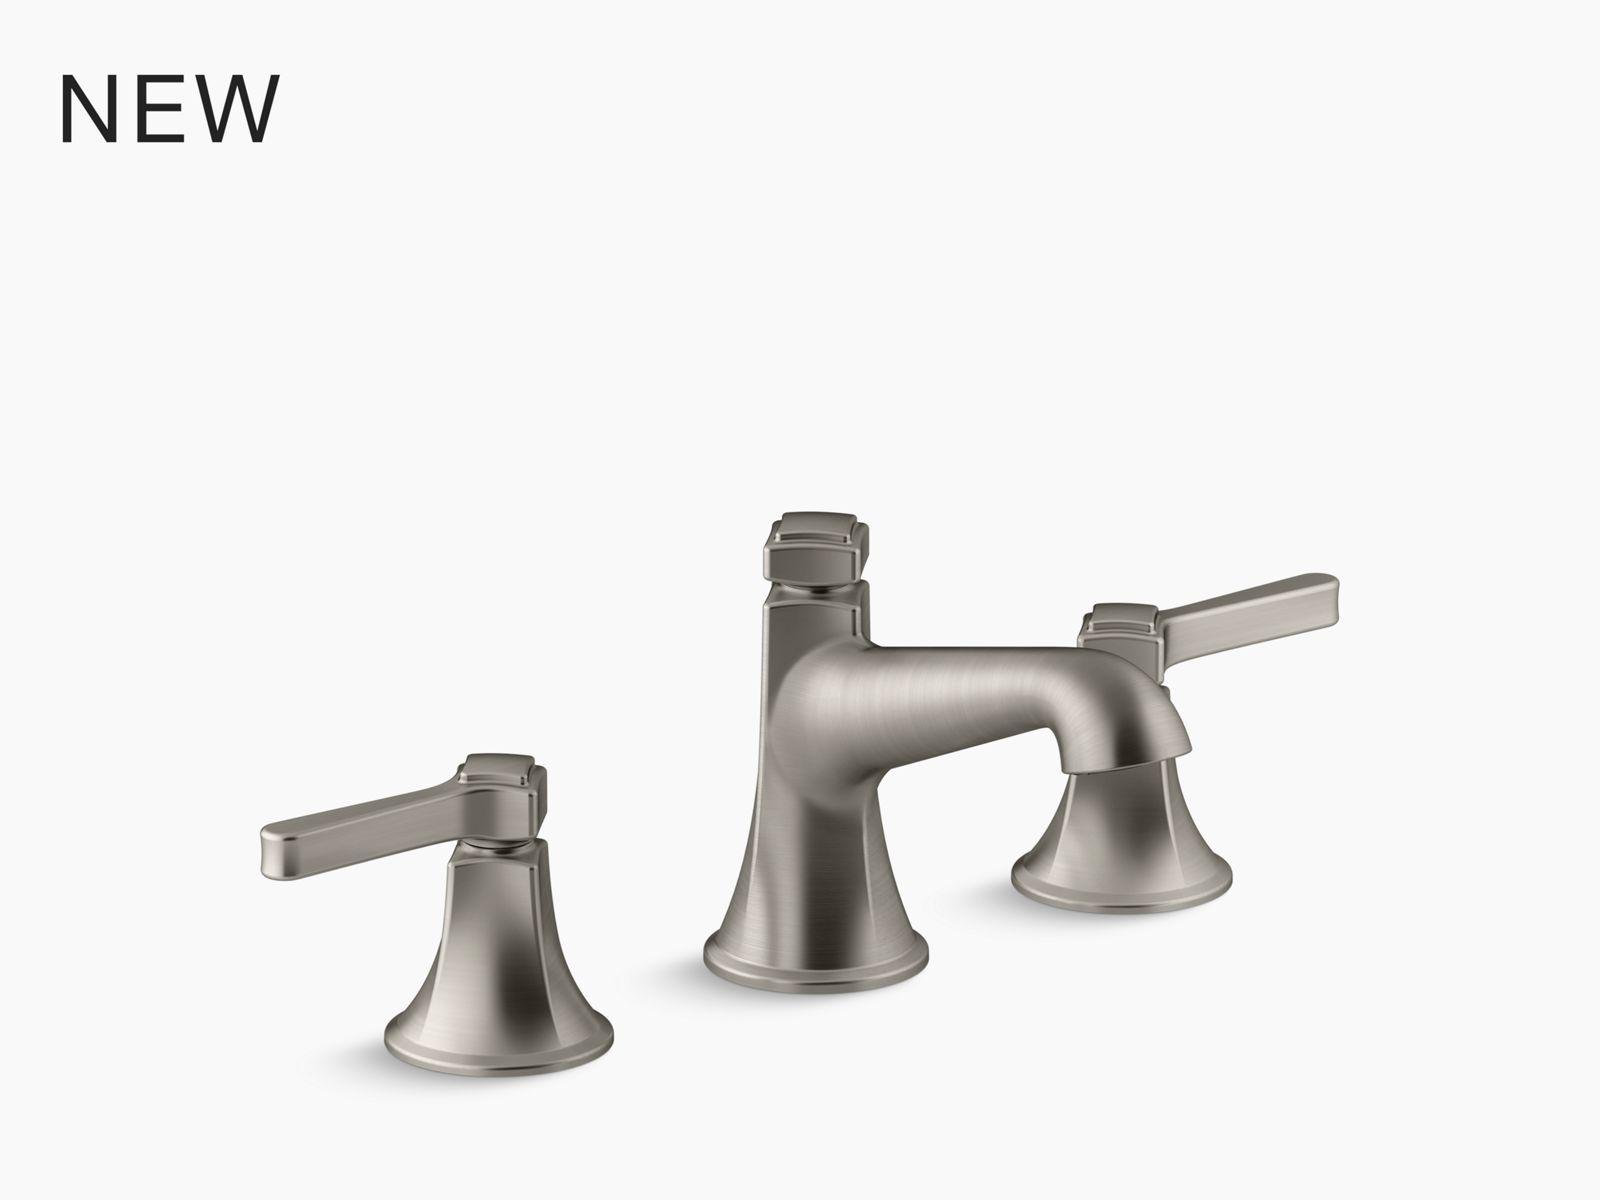 dickinson 33 x 22 1 8 x 8 5 8 undermount single bowl farmhouse kitchen sink with 4 oversize faucet holes